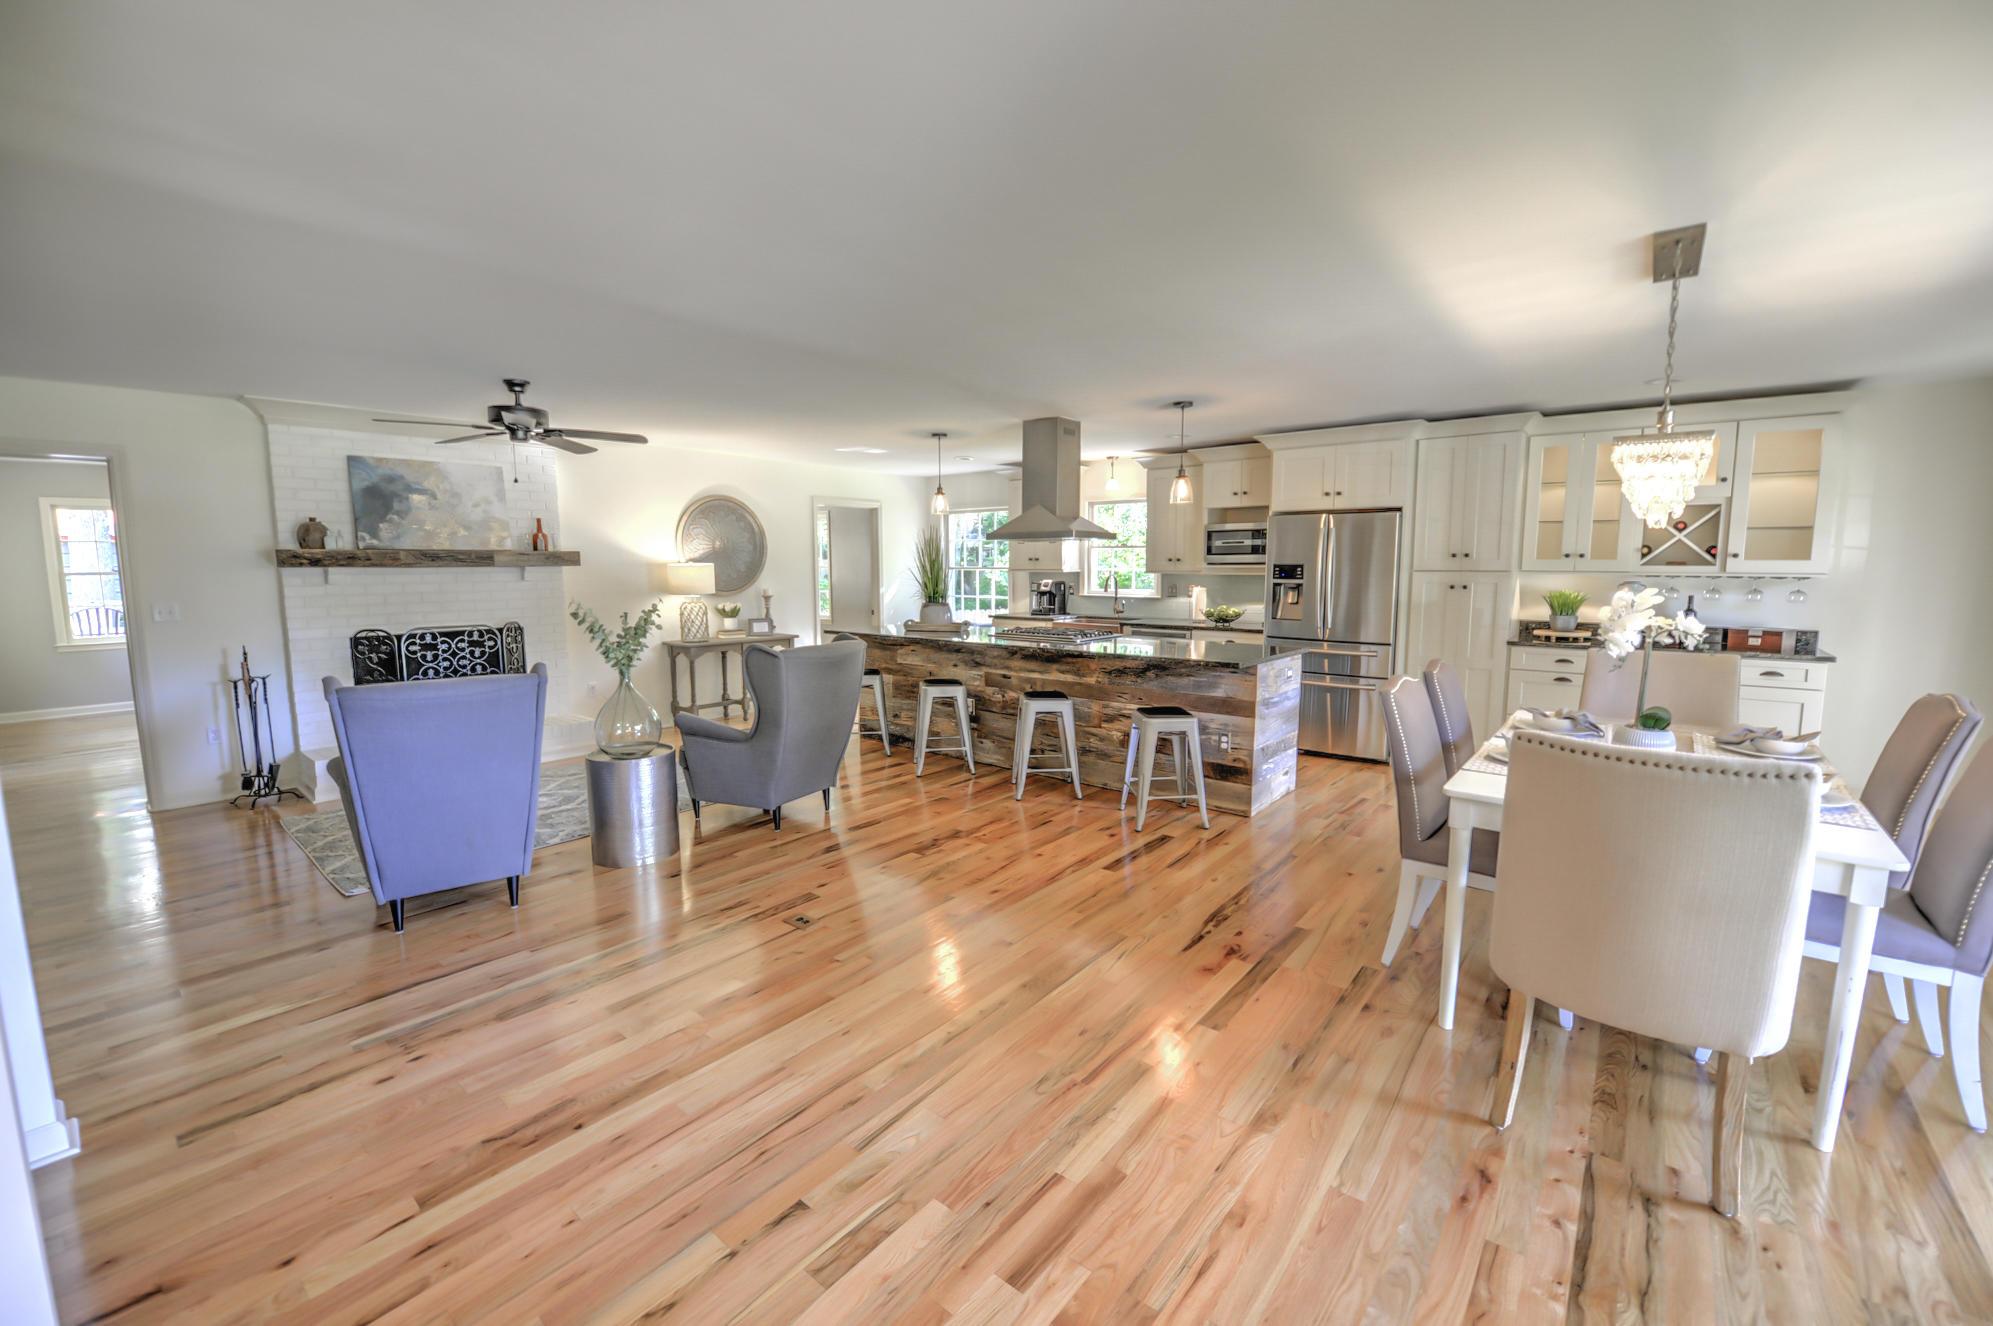 Shemwood II Homes For Sale - 1017 Jack Snipe, Mount Pleasant, SC - 2